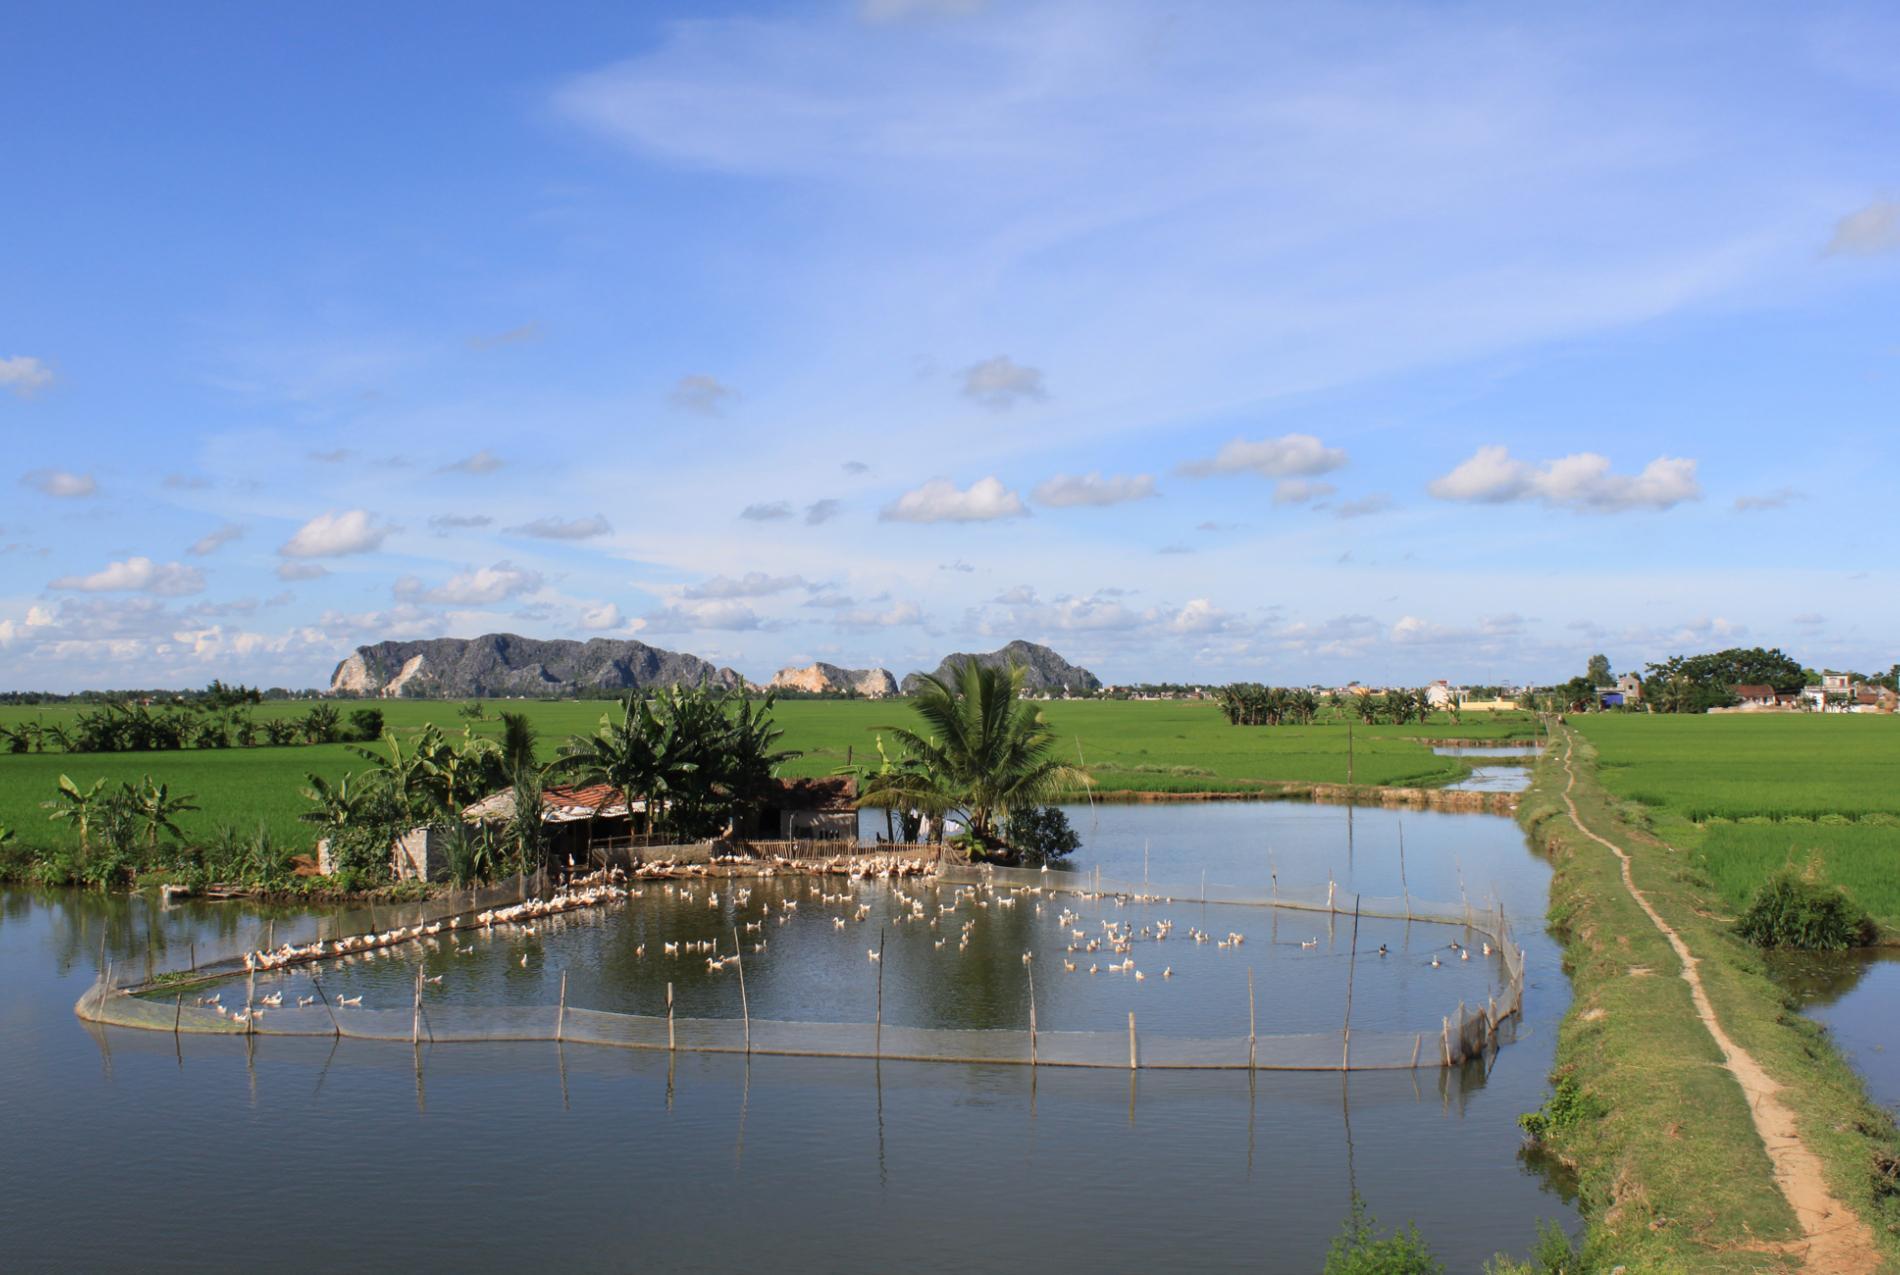 Voyage solidaire Vietnam-Cambodge : Vision du Monde - Photo 4